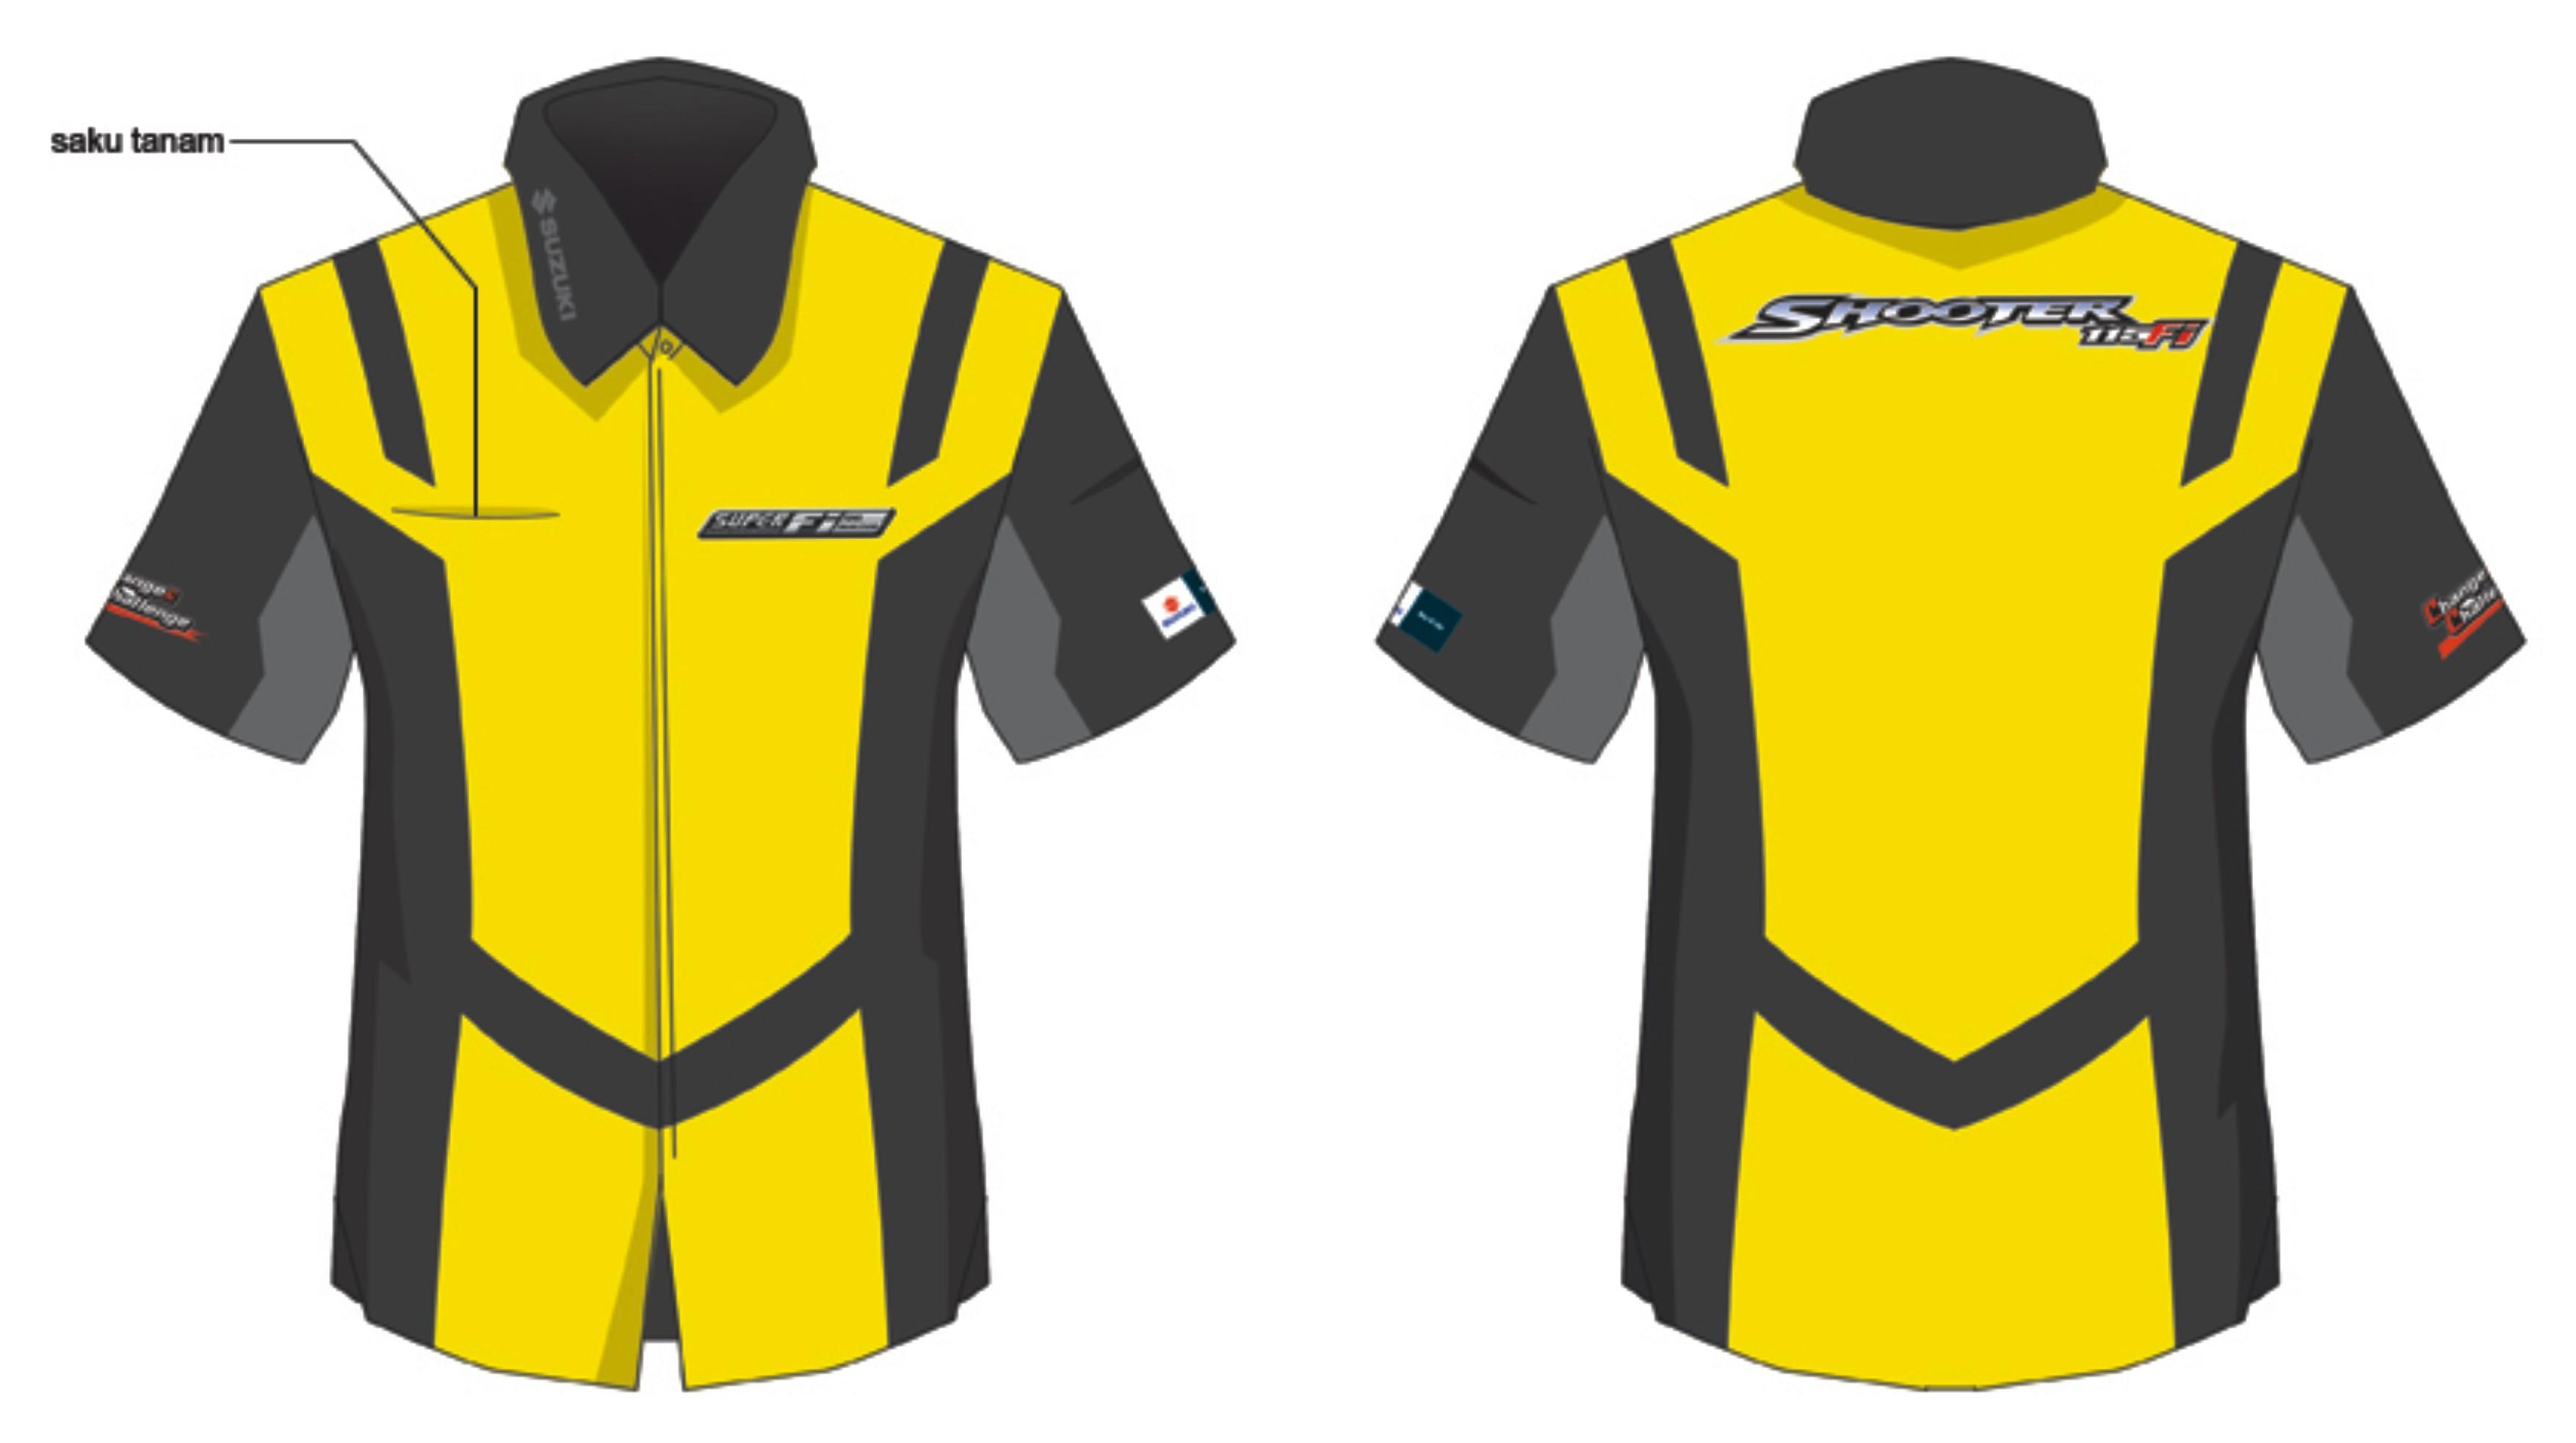 Konveksi Di Sidoarjo Kaos Jaket Supplier Baju Seragam Kerja Produk Ukm Bumn Oblong Pesan Kantor Kombinasi Batik Surabaya